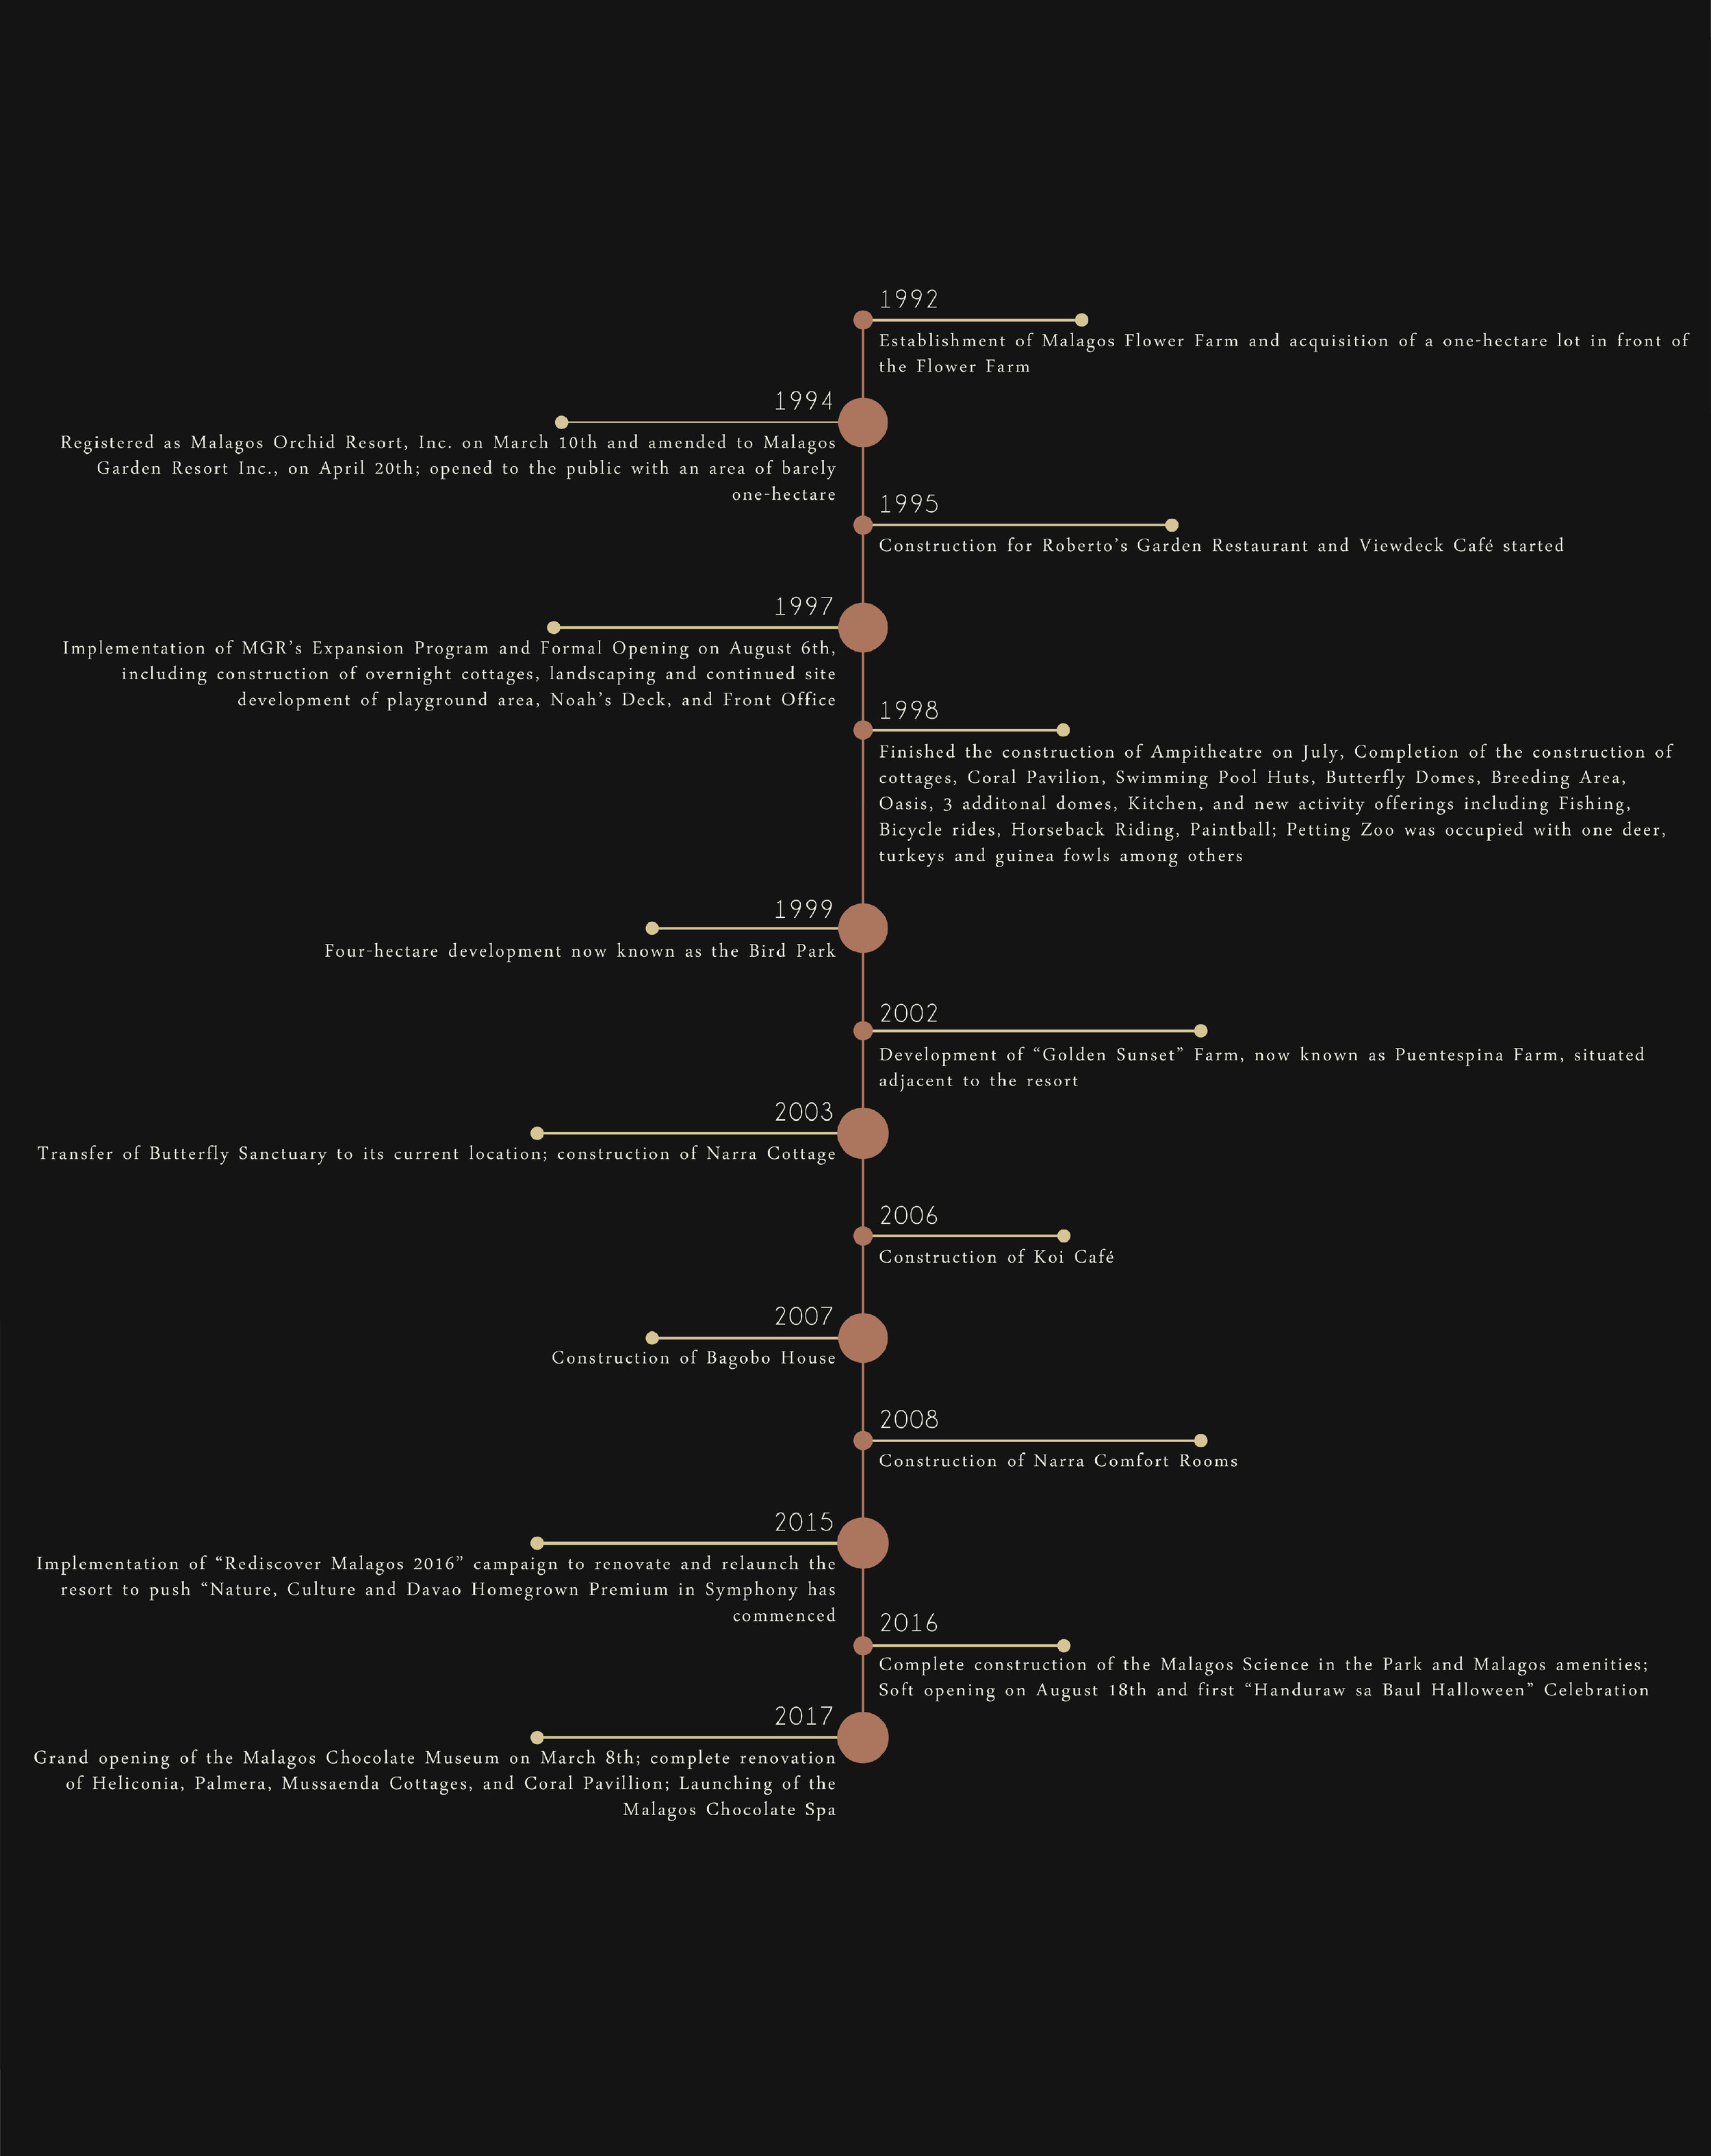 MGR Story Timeline VectoR-01-01.jpg